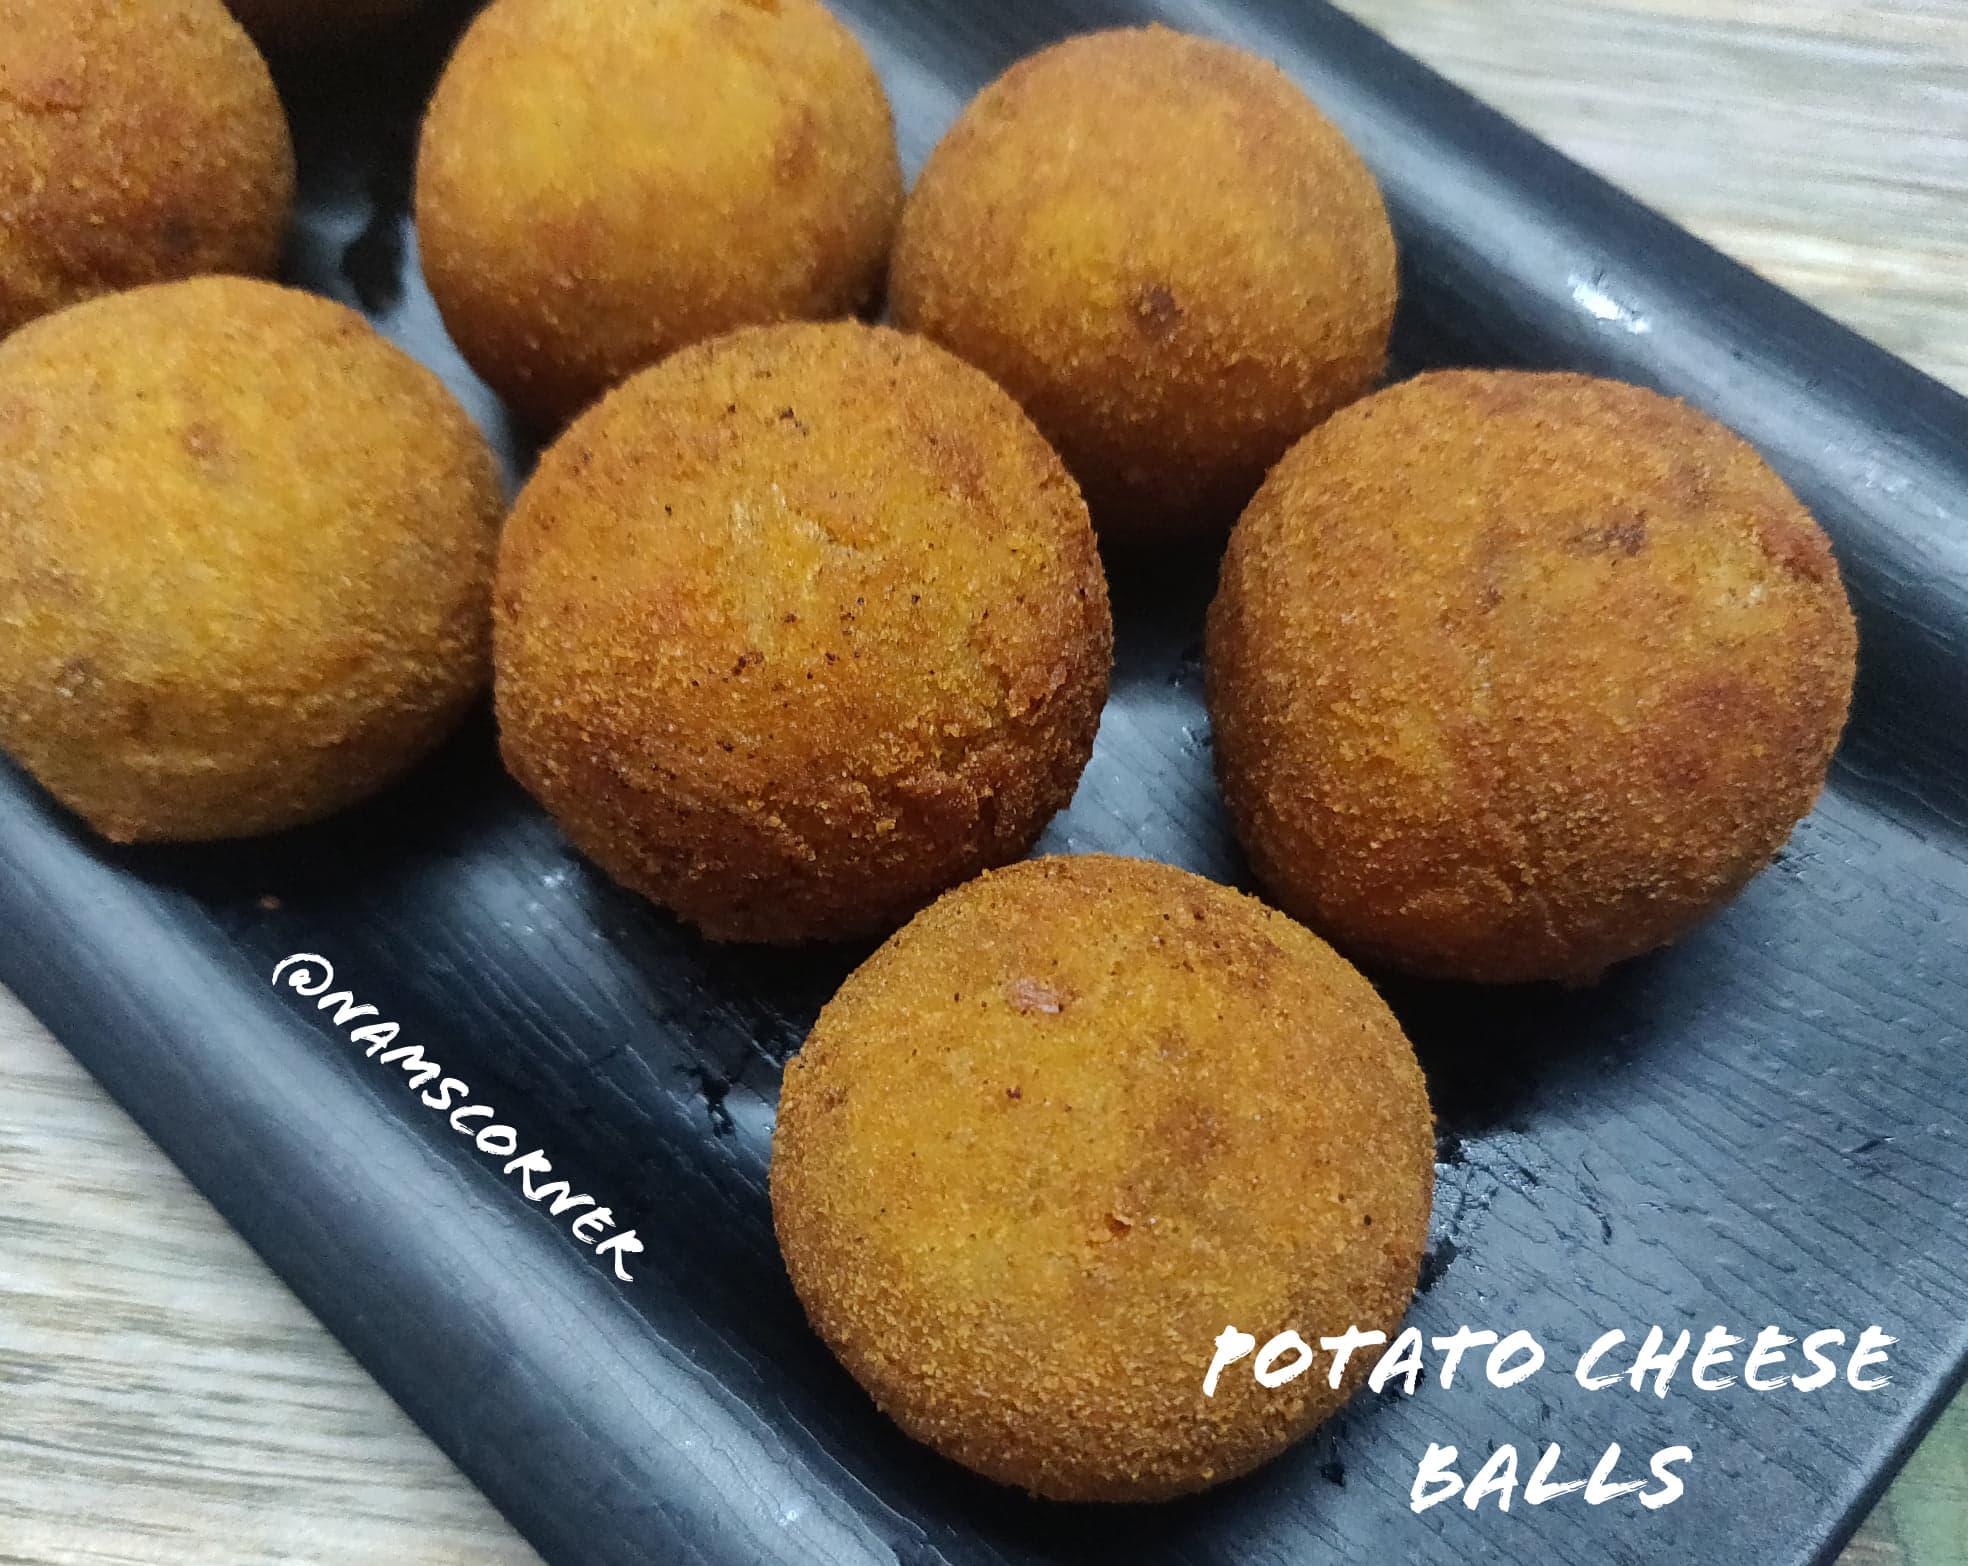 Potato Cheese Balls Recipe | Cheese Balls